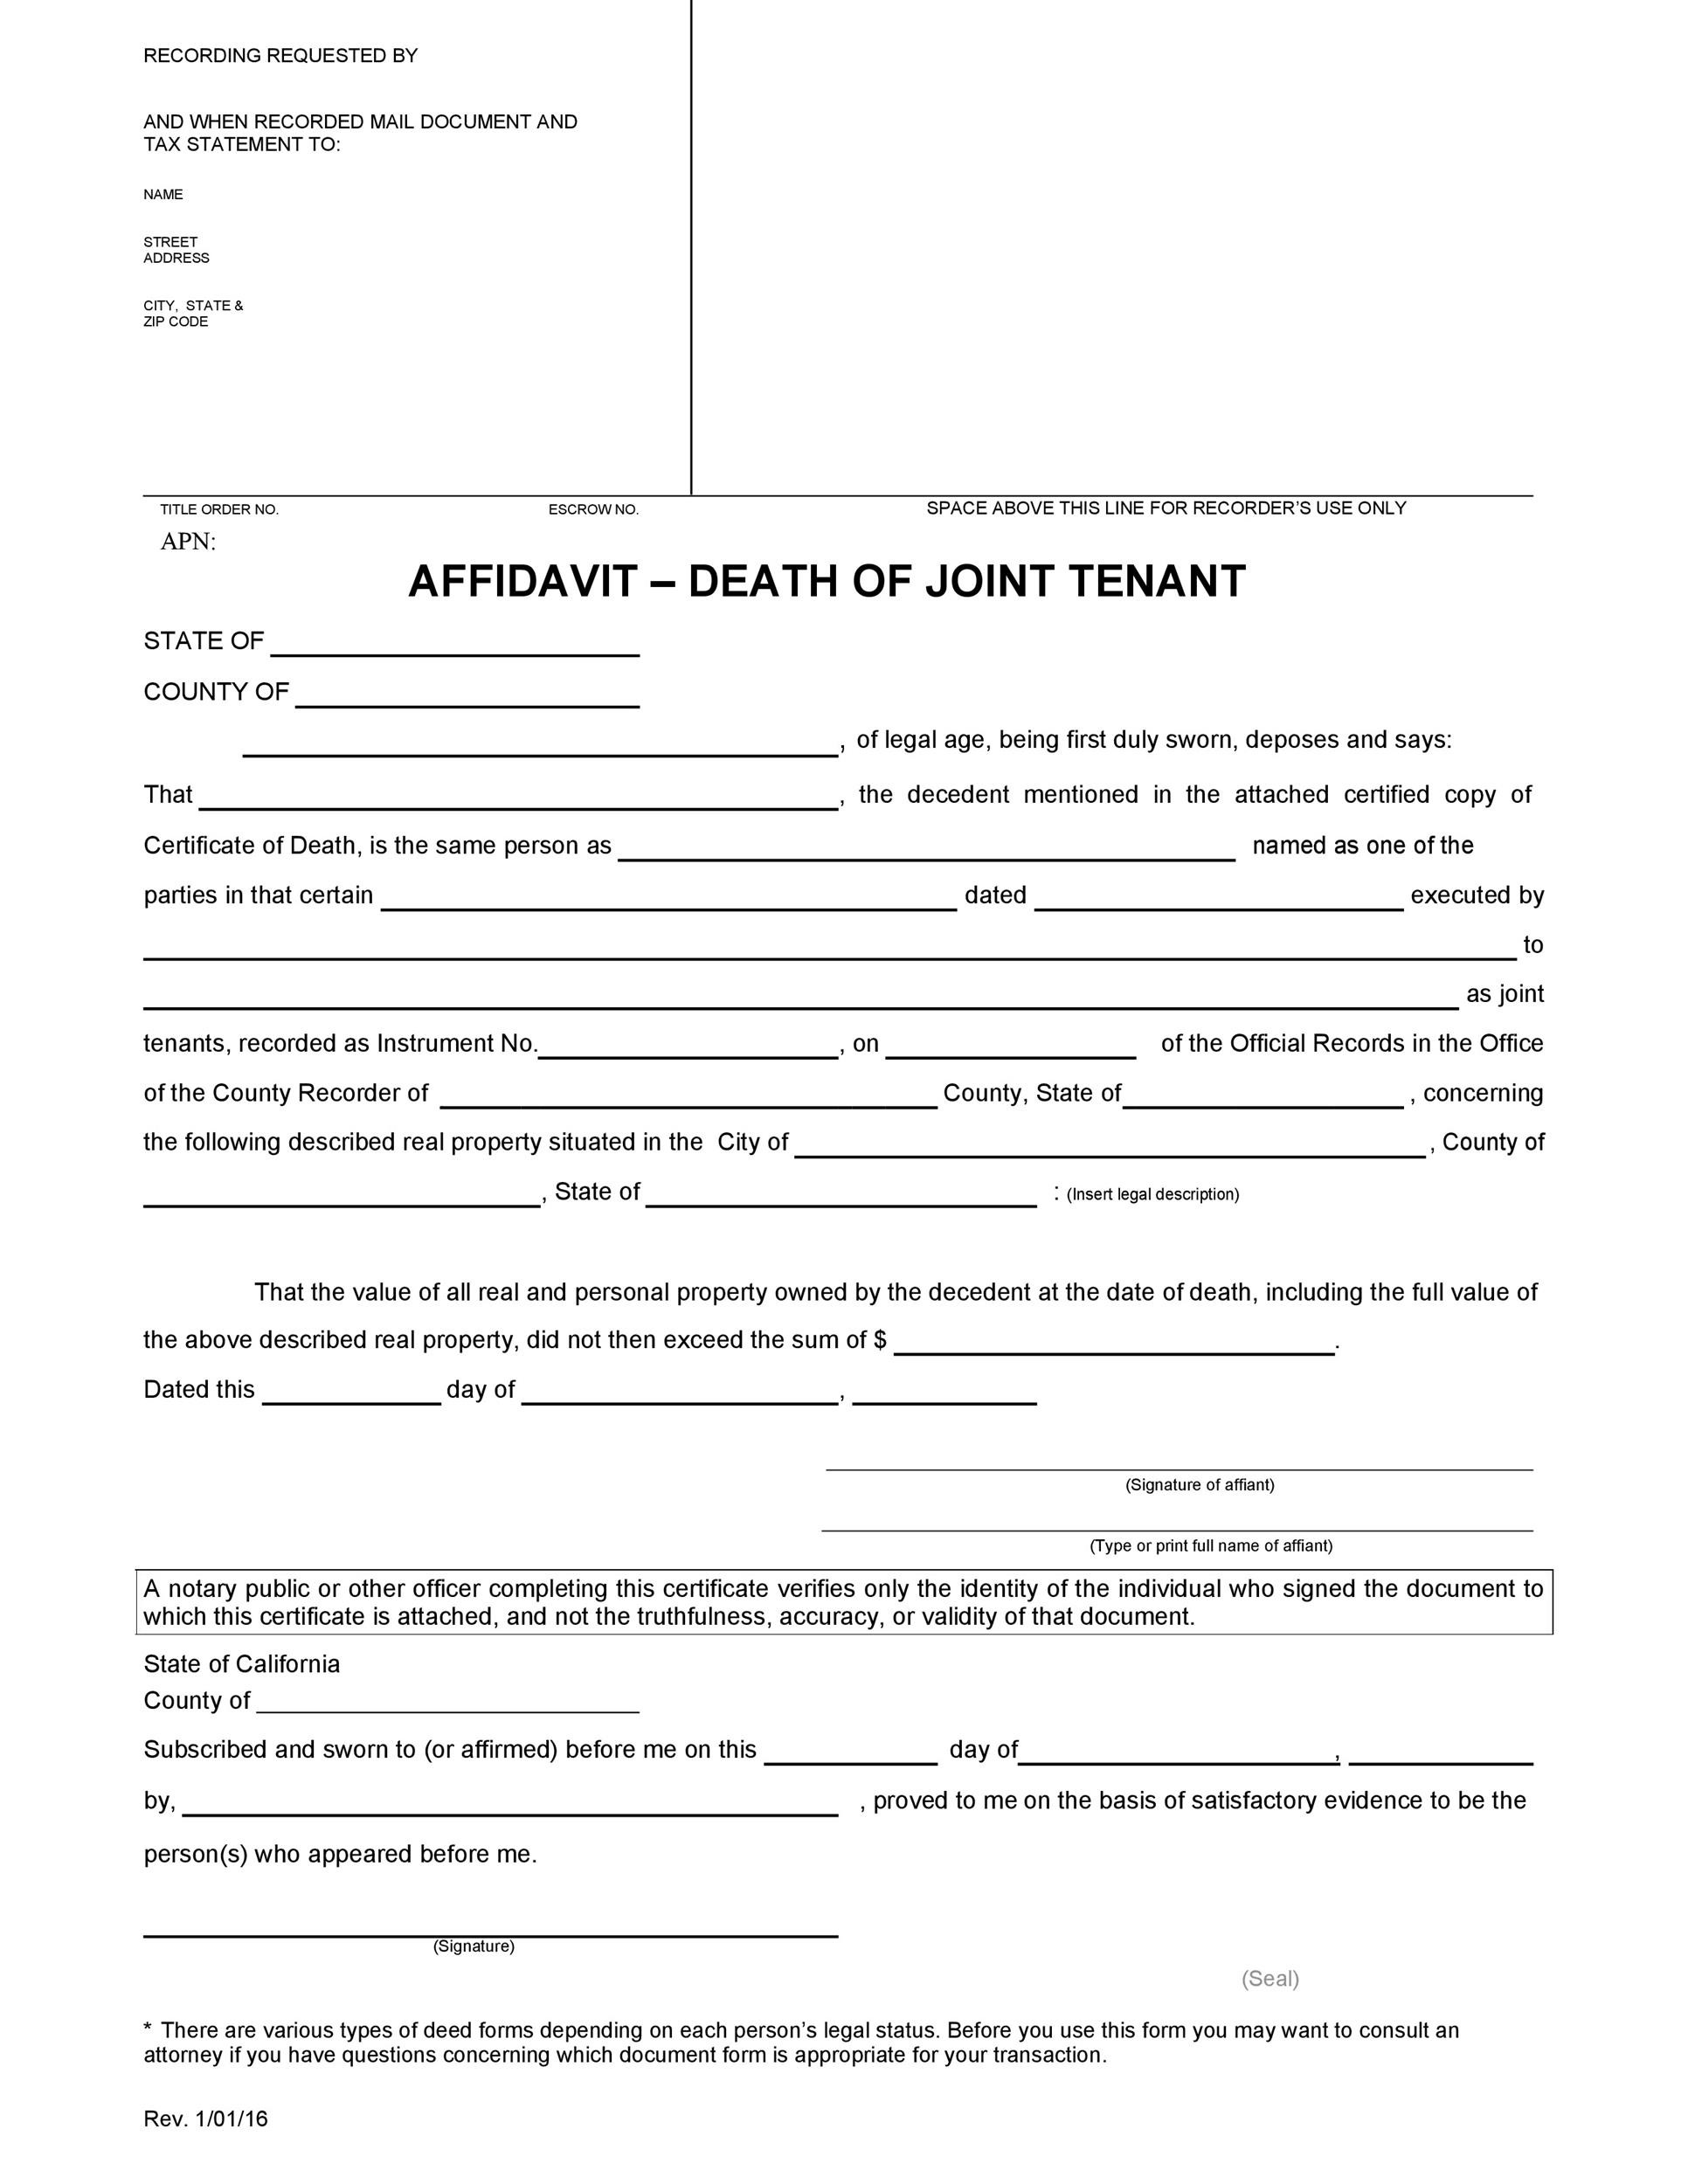 Free affidavit of death 42